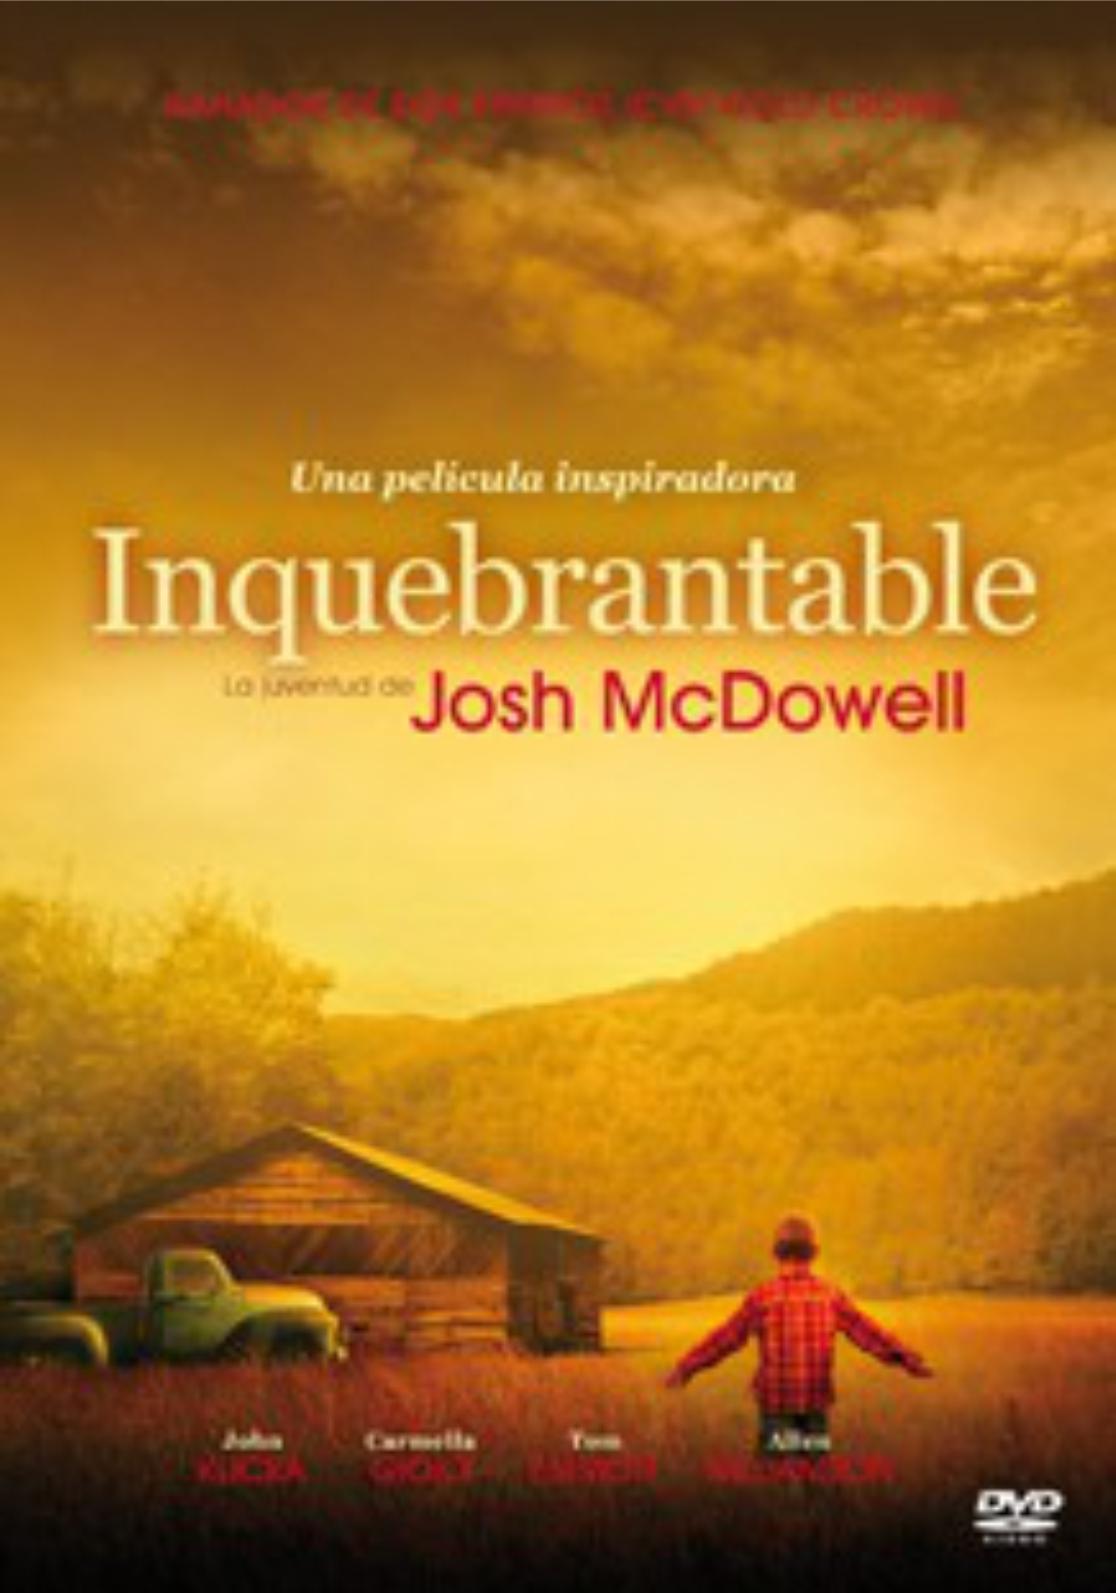 Inquebrantable: La vida de Josh McDowell